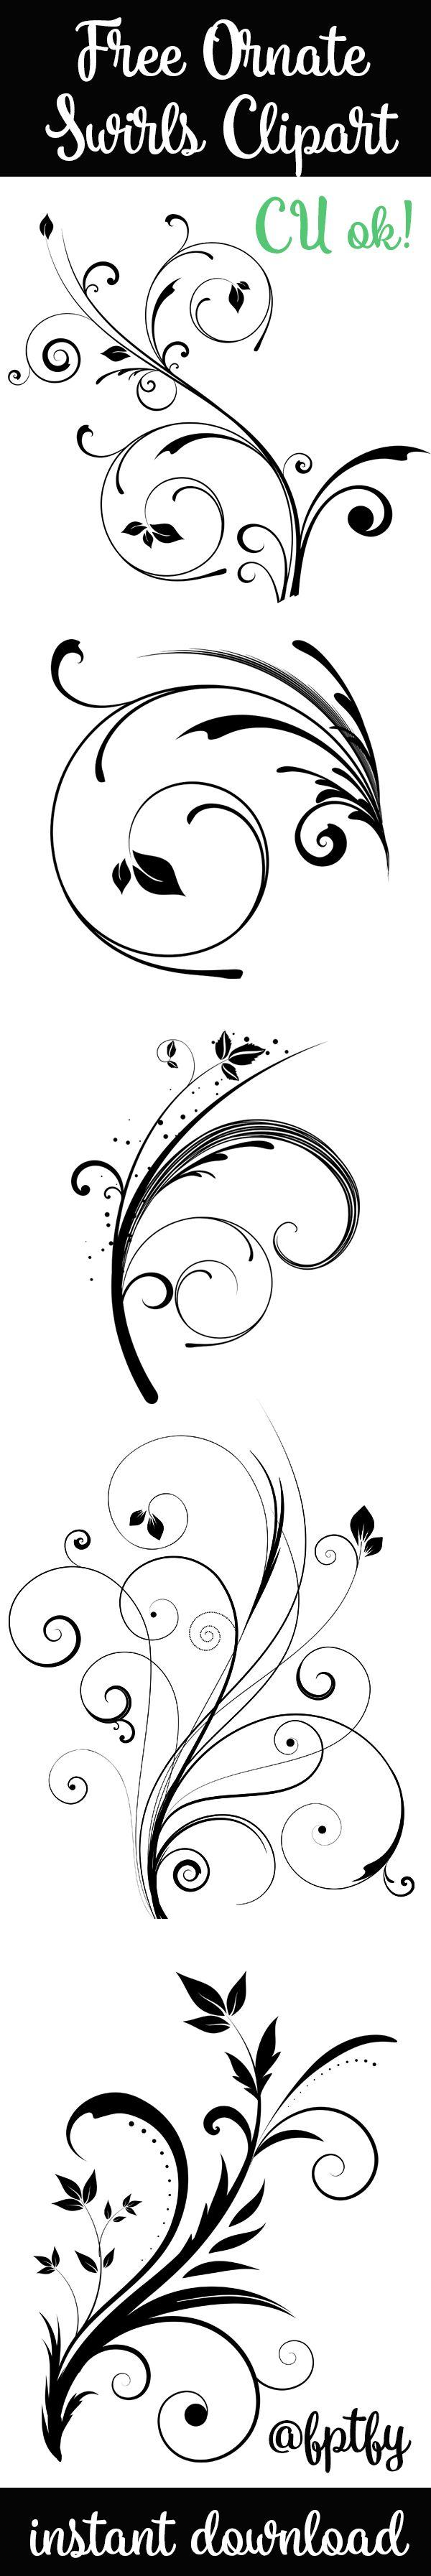 9 Free Ornate Swirl Clipart -CU ok! - Free Pretty Things For You